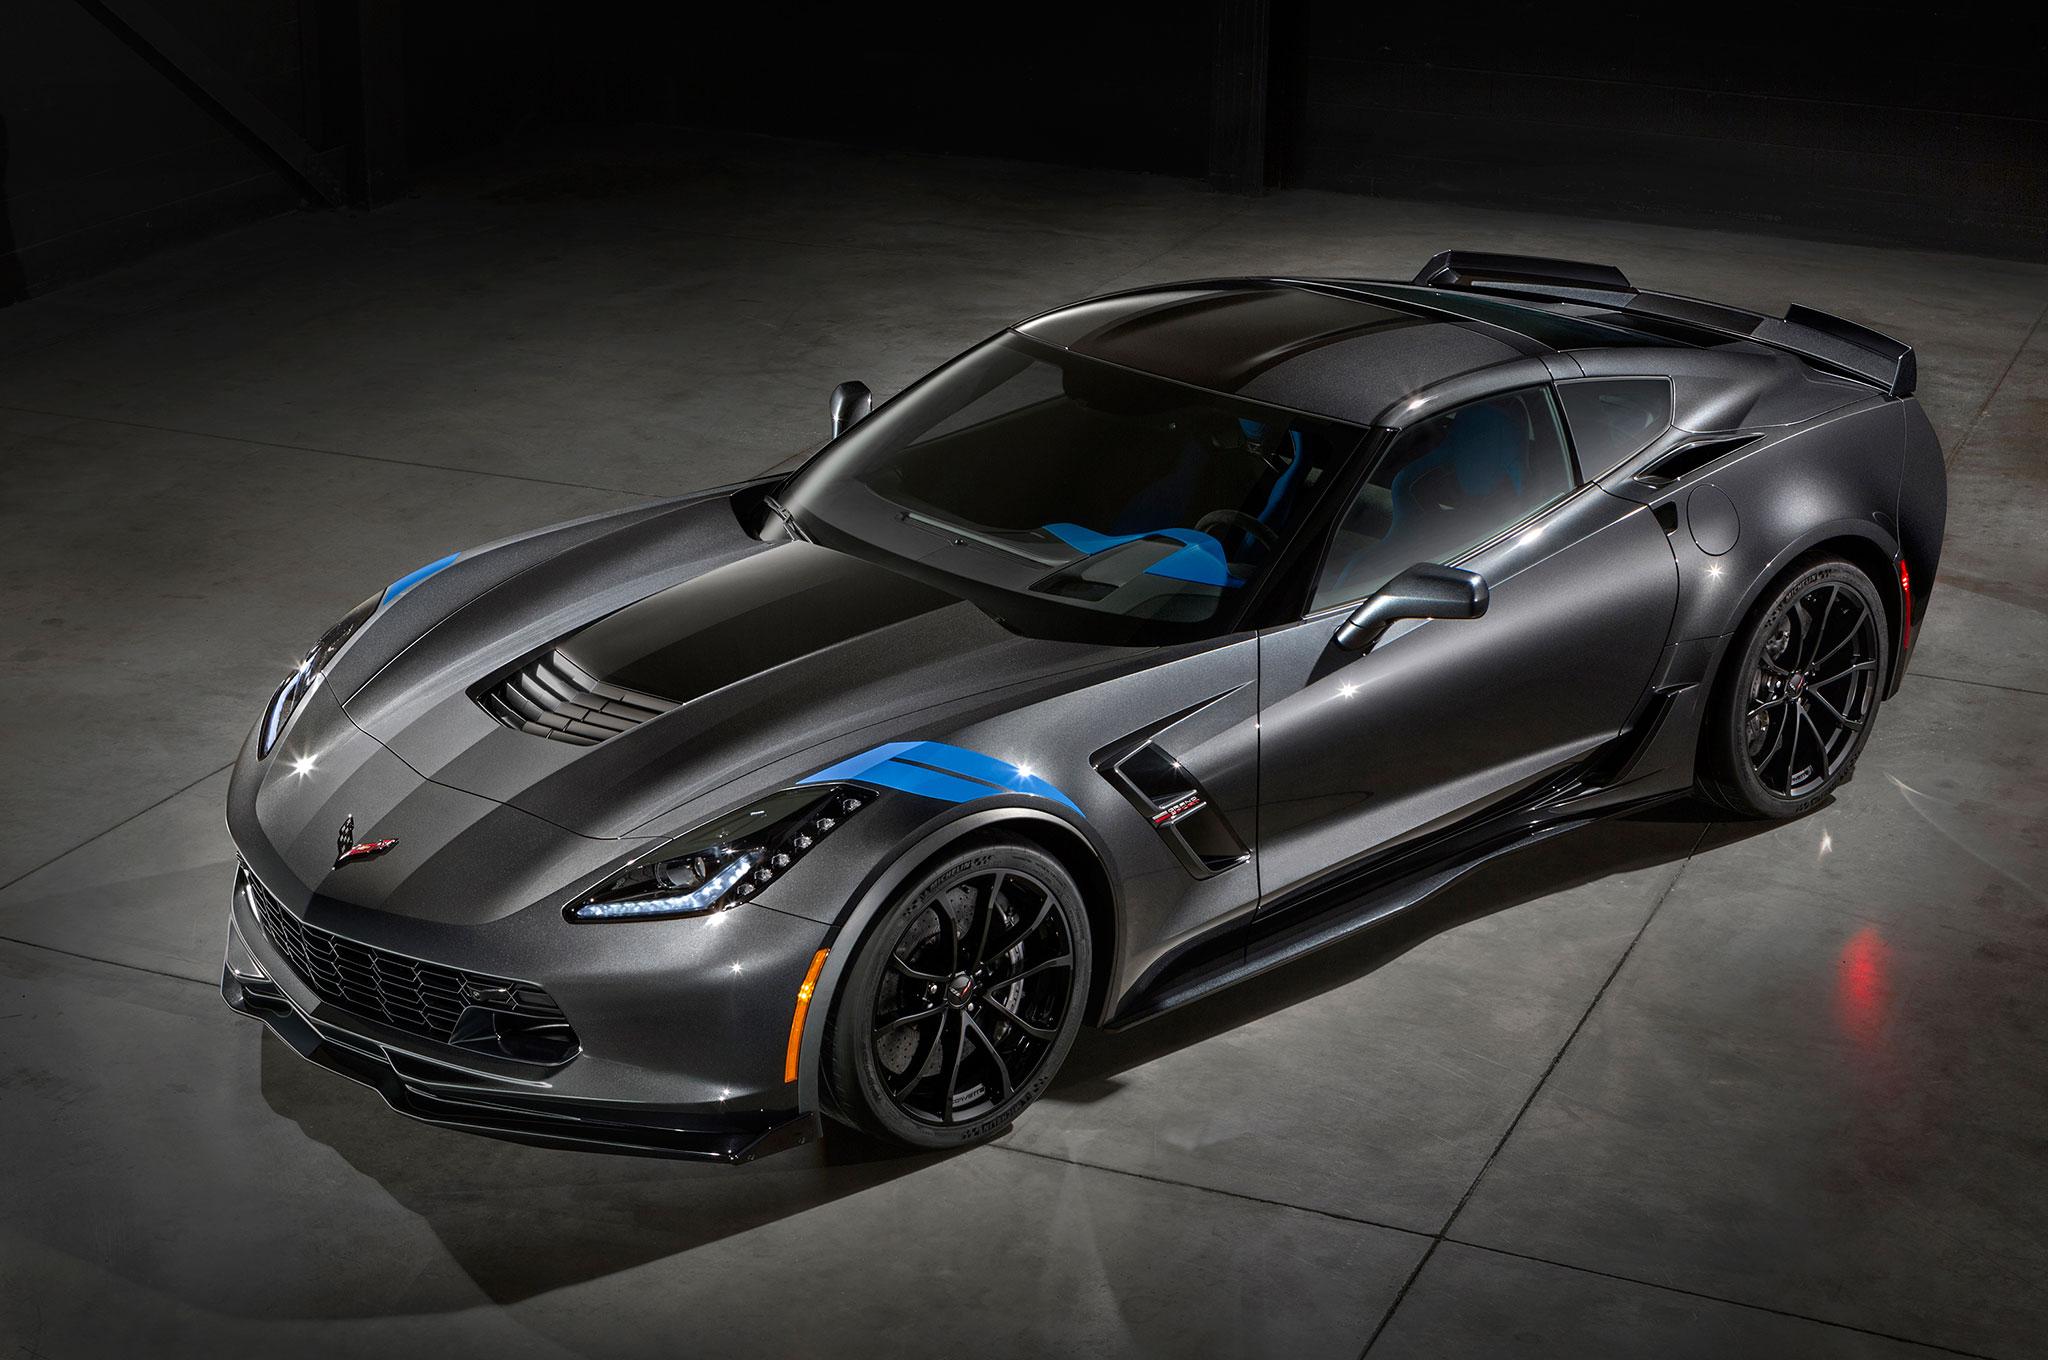 2017 Chevrolet Corvette Grand Sport Front Three Quarter